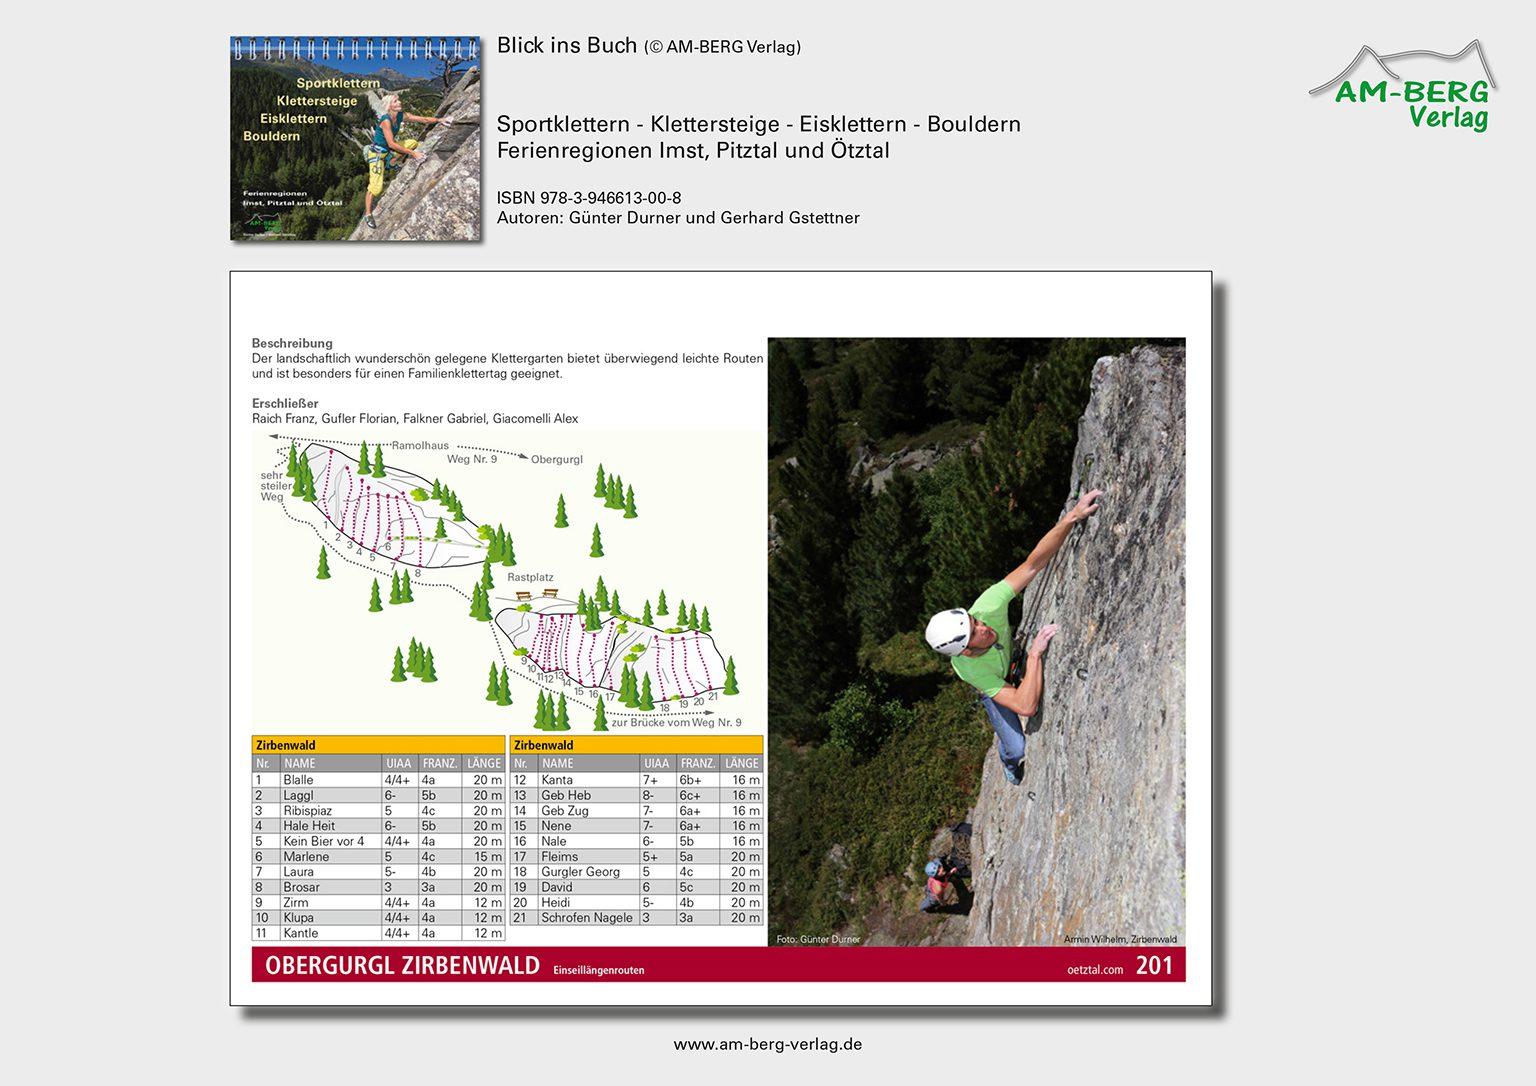 Sportklettern Imst-Pitztal-Ötztal_BlickinsBuch08_Obergurgl-Zirbenwald